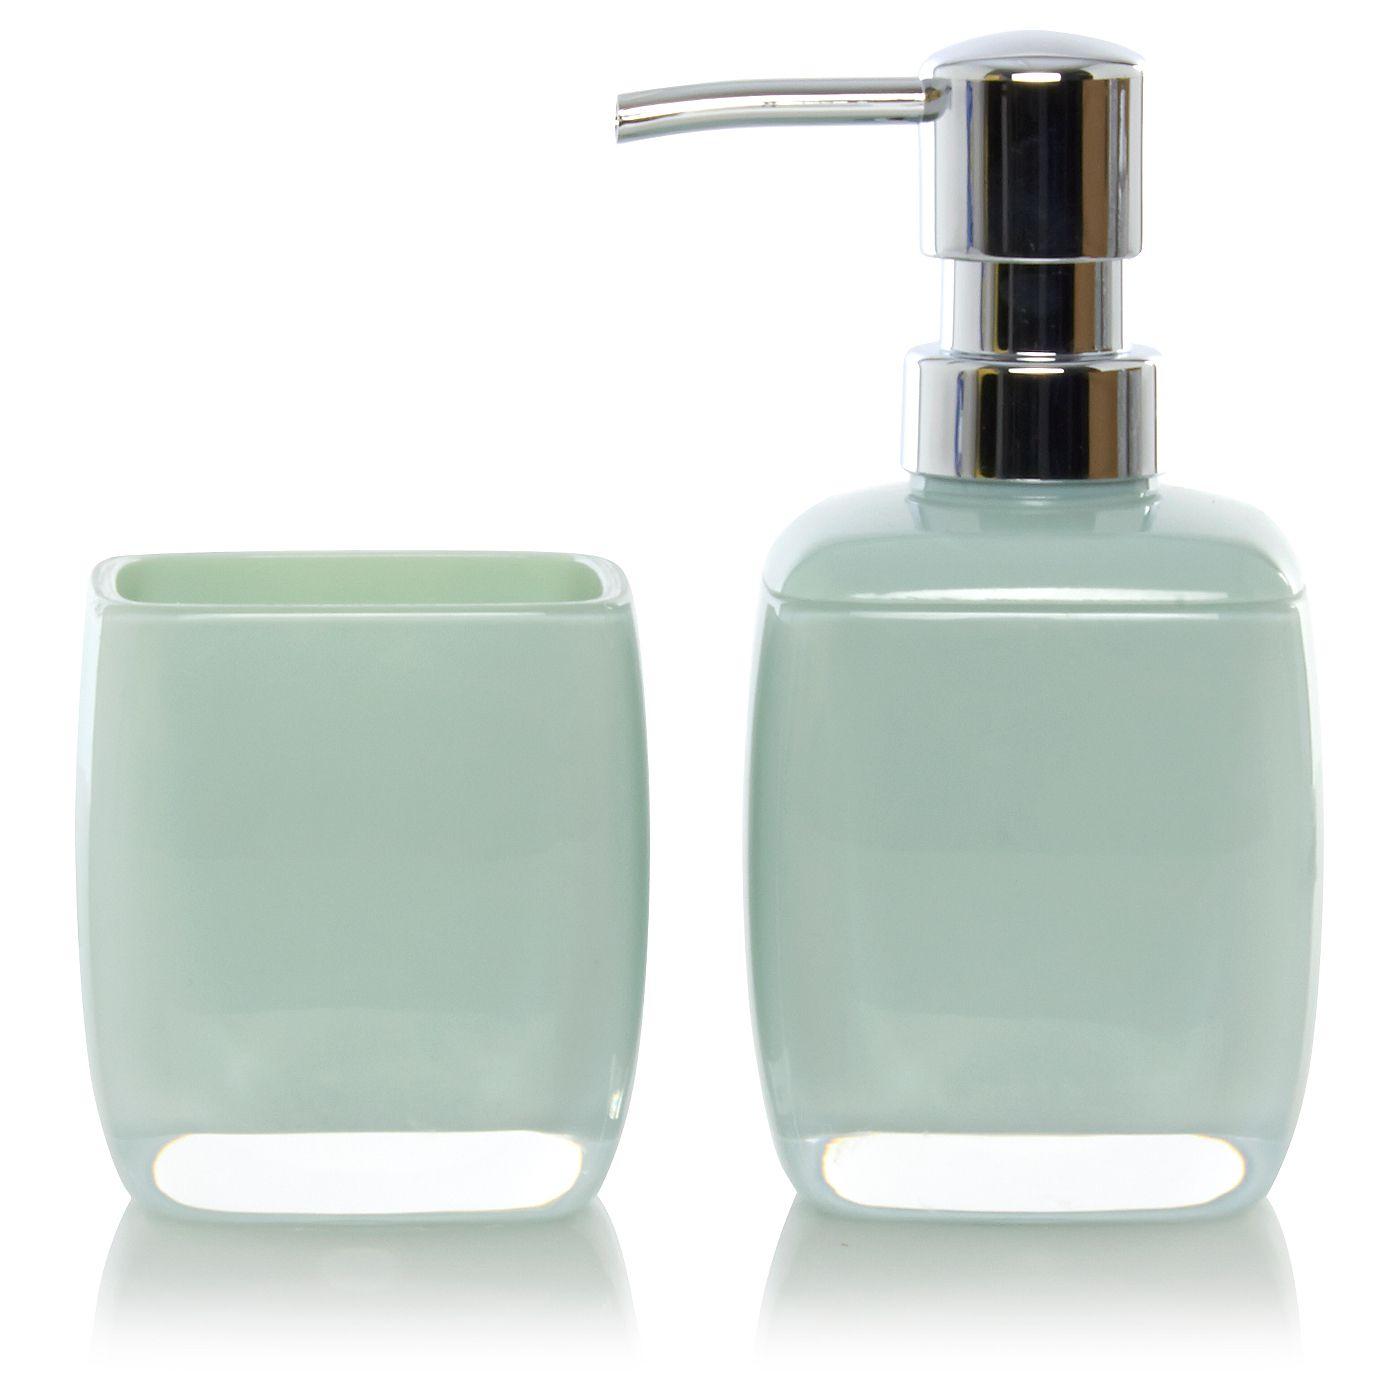 george home mint acrylic bathroom accessories greens asda direct